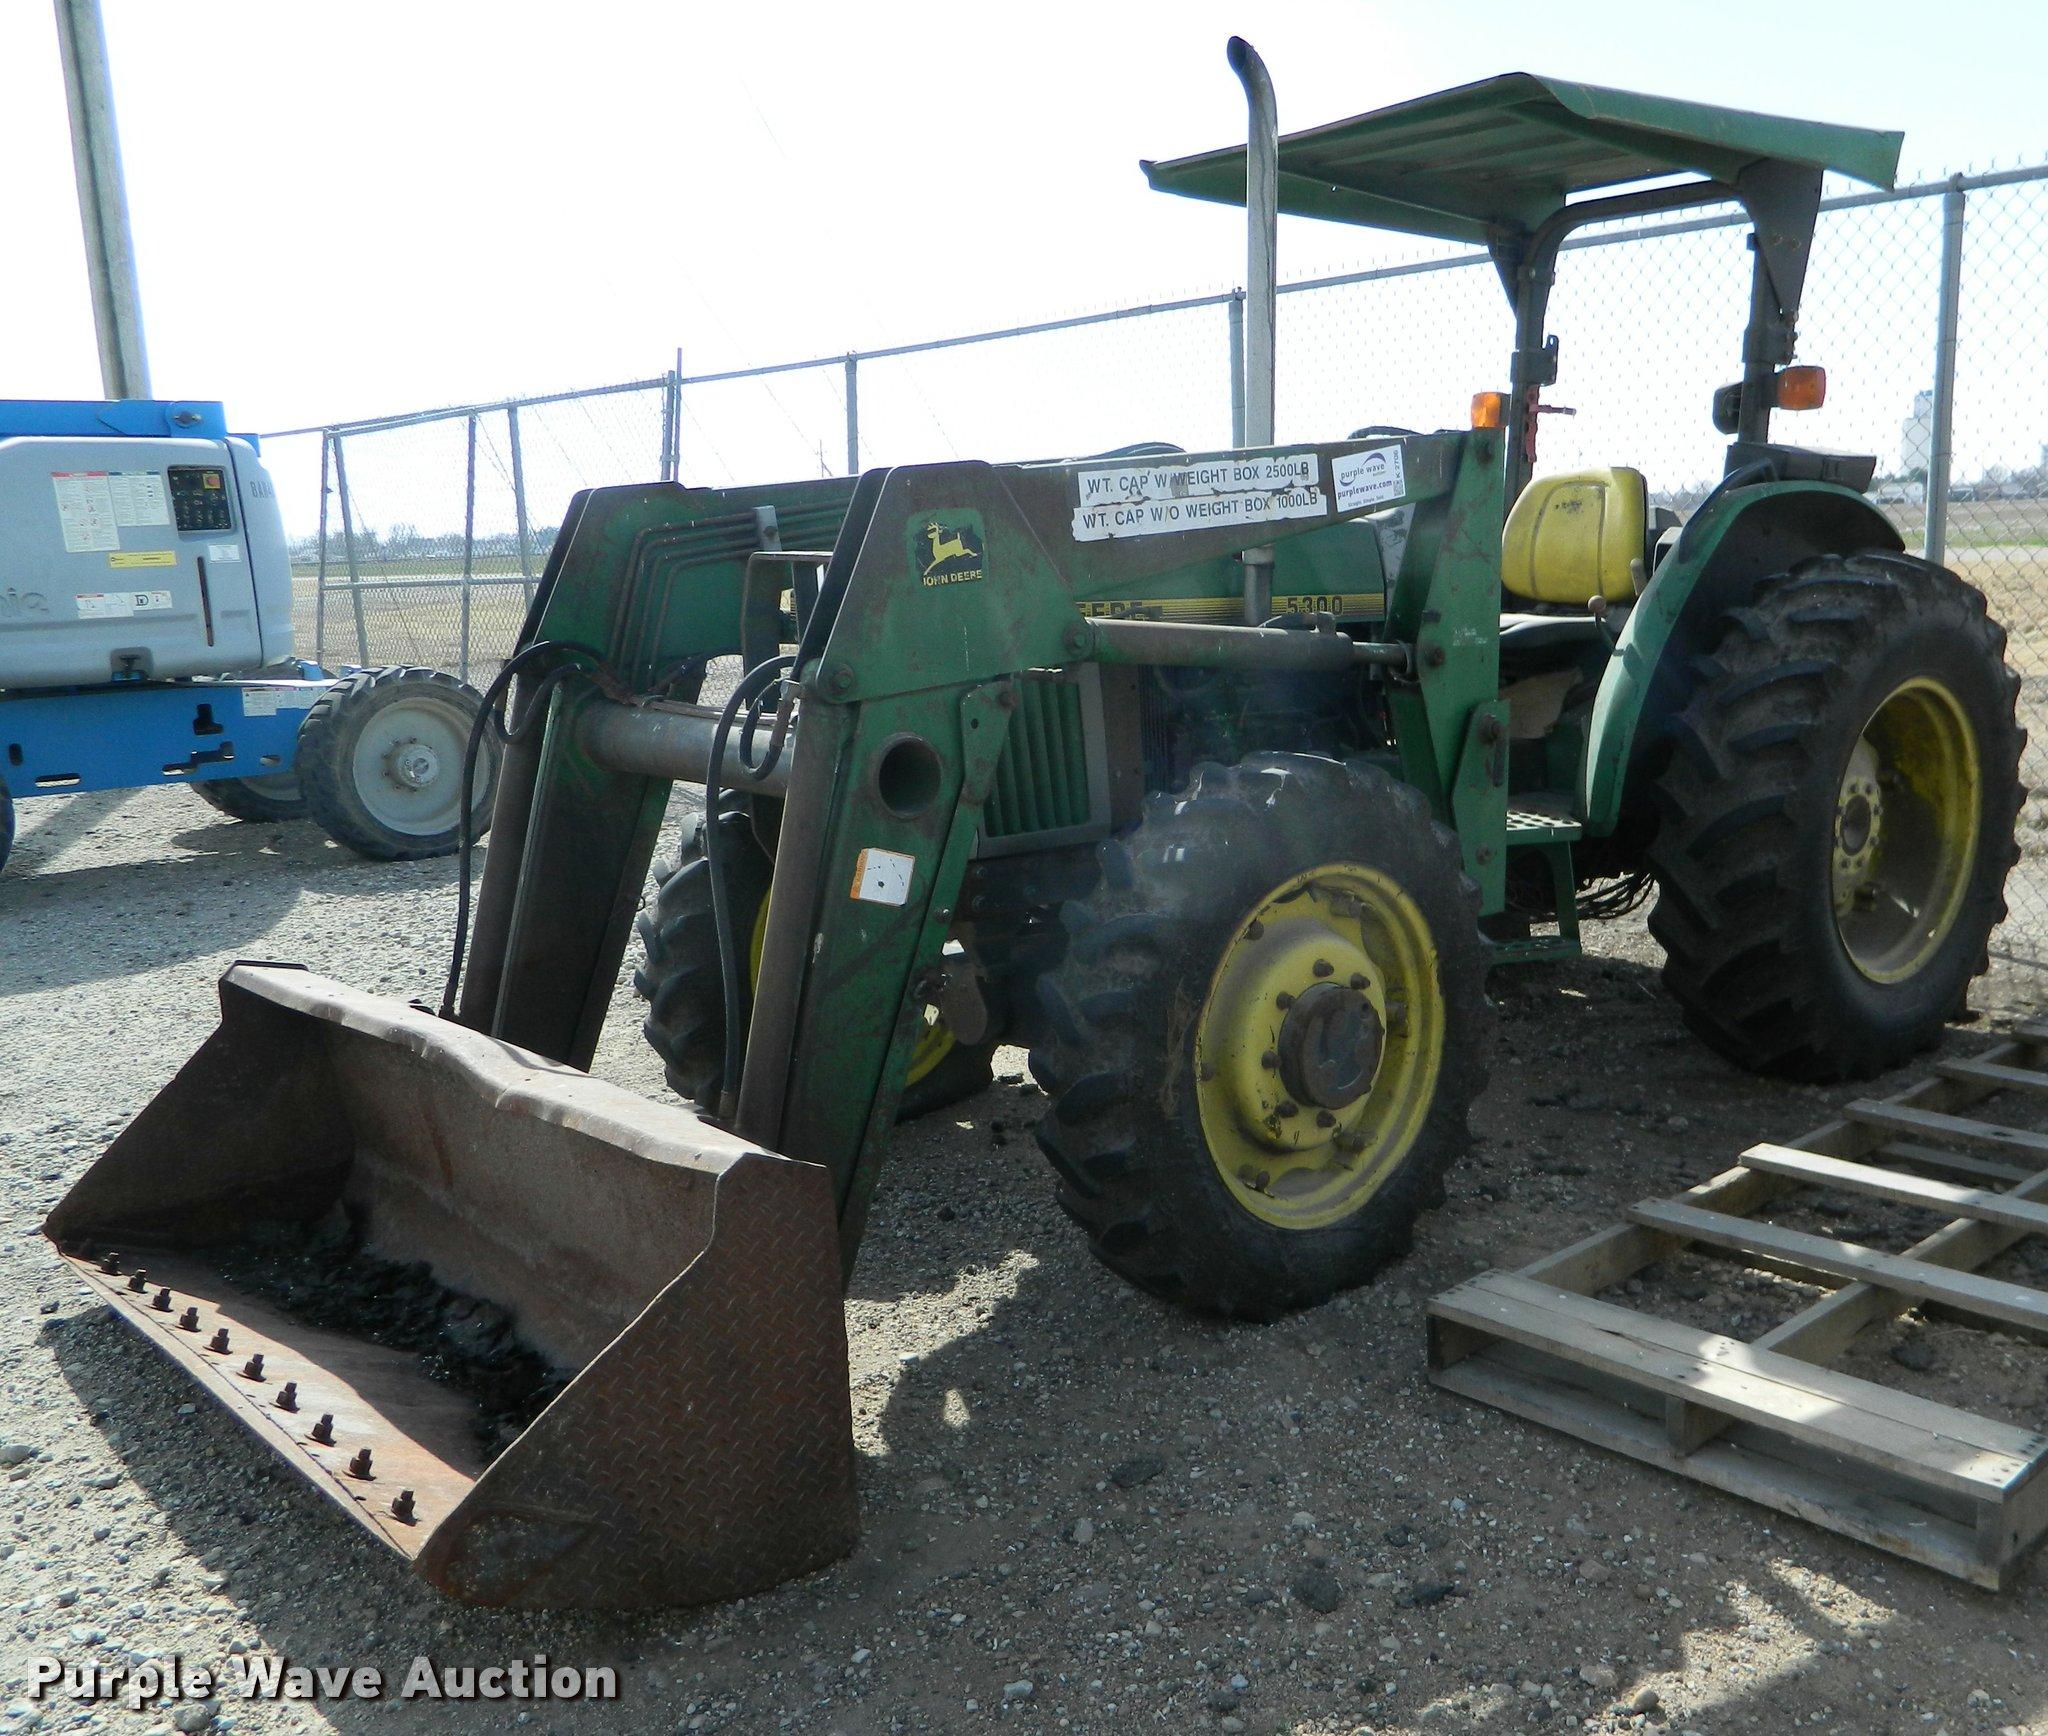 K2706A 1996 john deere 5300 mfwd tractor item k2706 sold! march